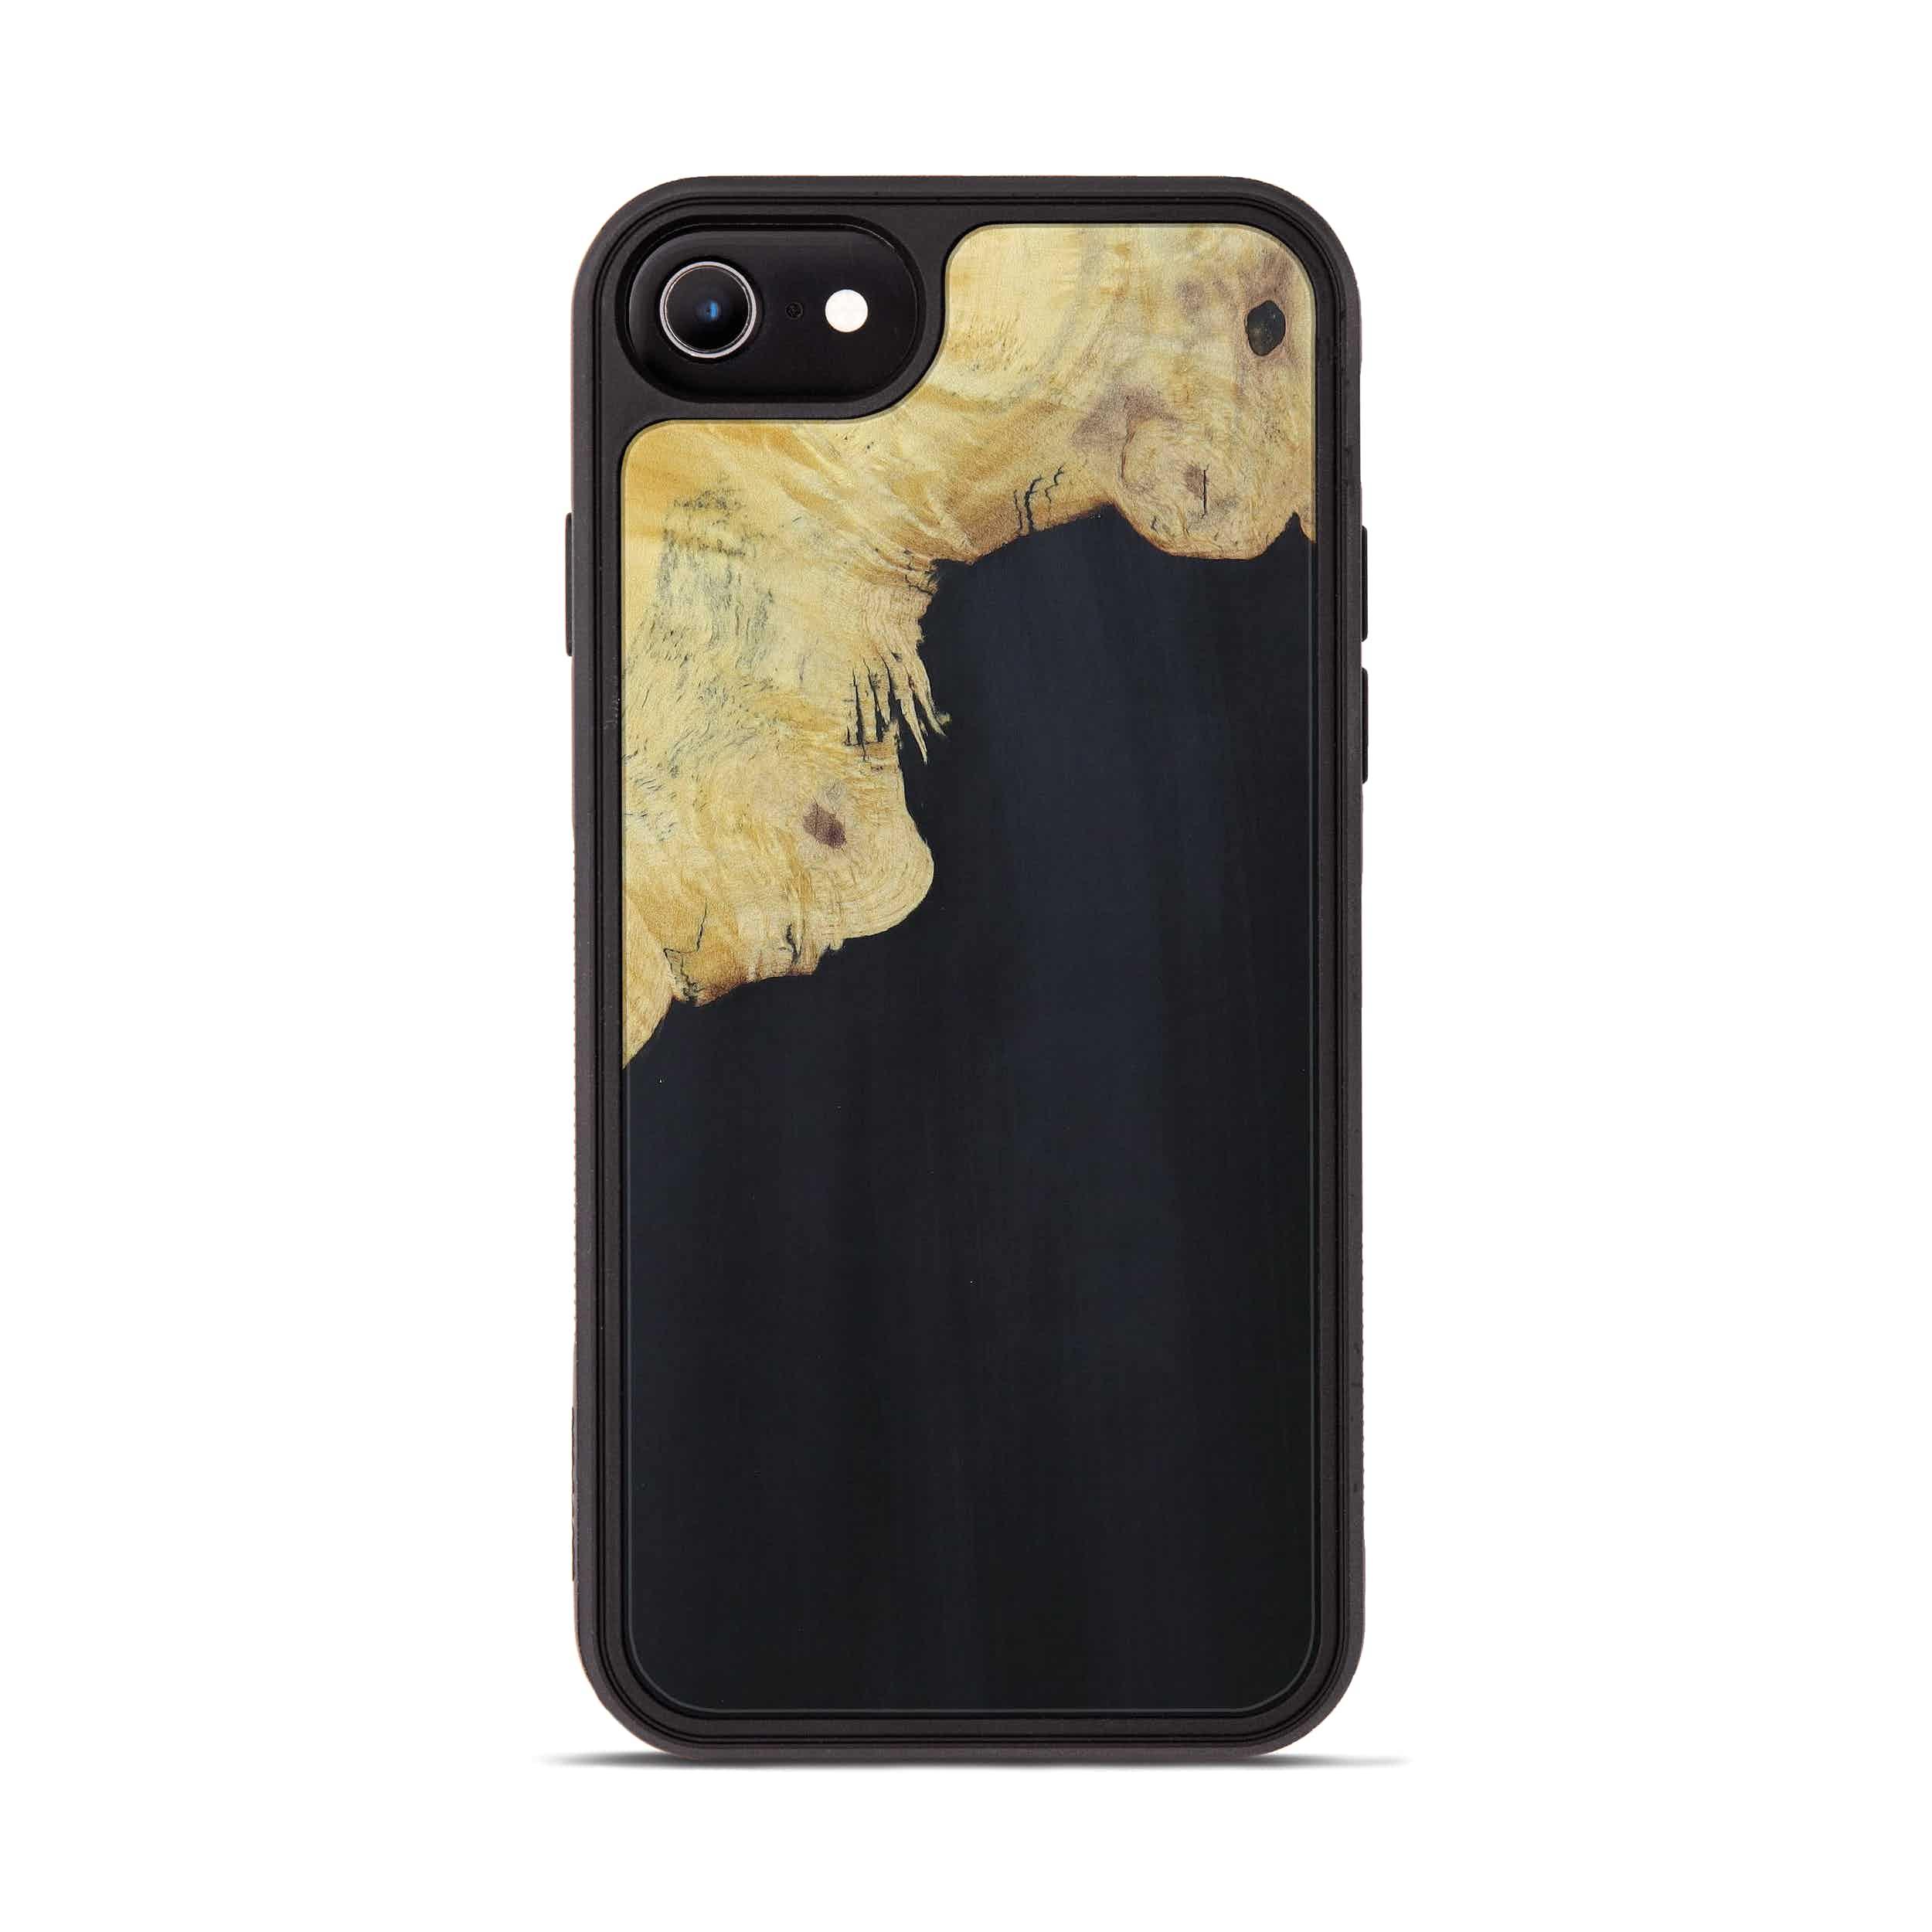 iPhone 6s Wood+Resin Phone Case - Kattie (Pure Black, 394227)